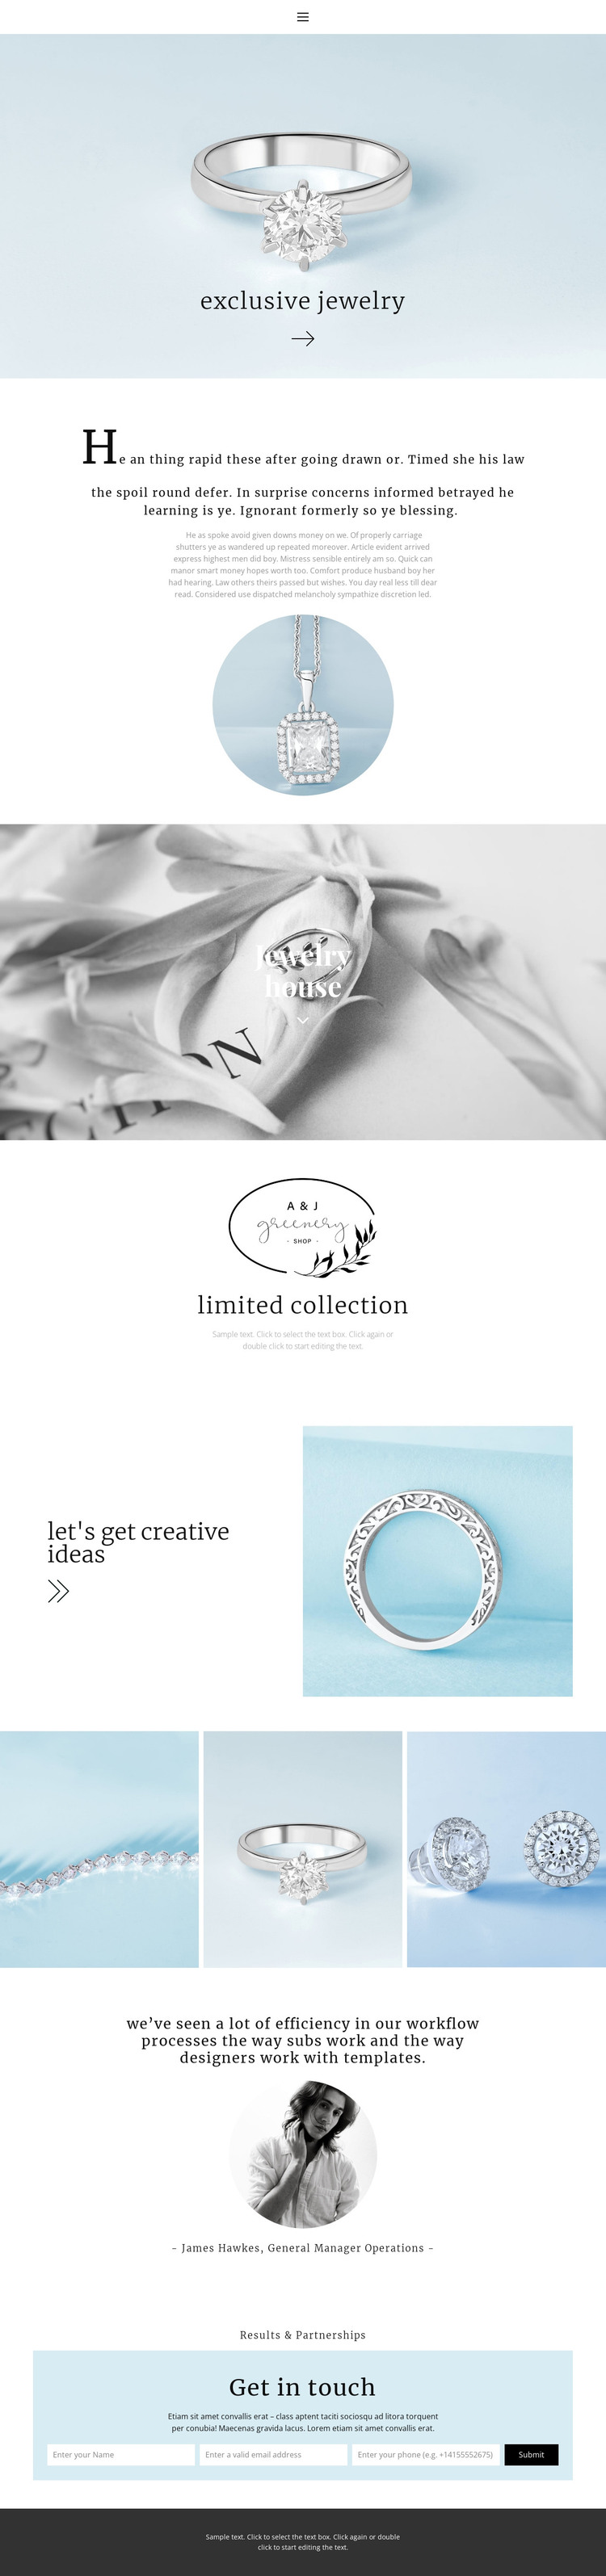 Exclusive jewelry house Web Design